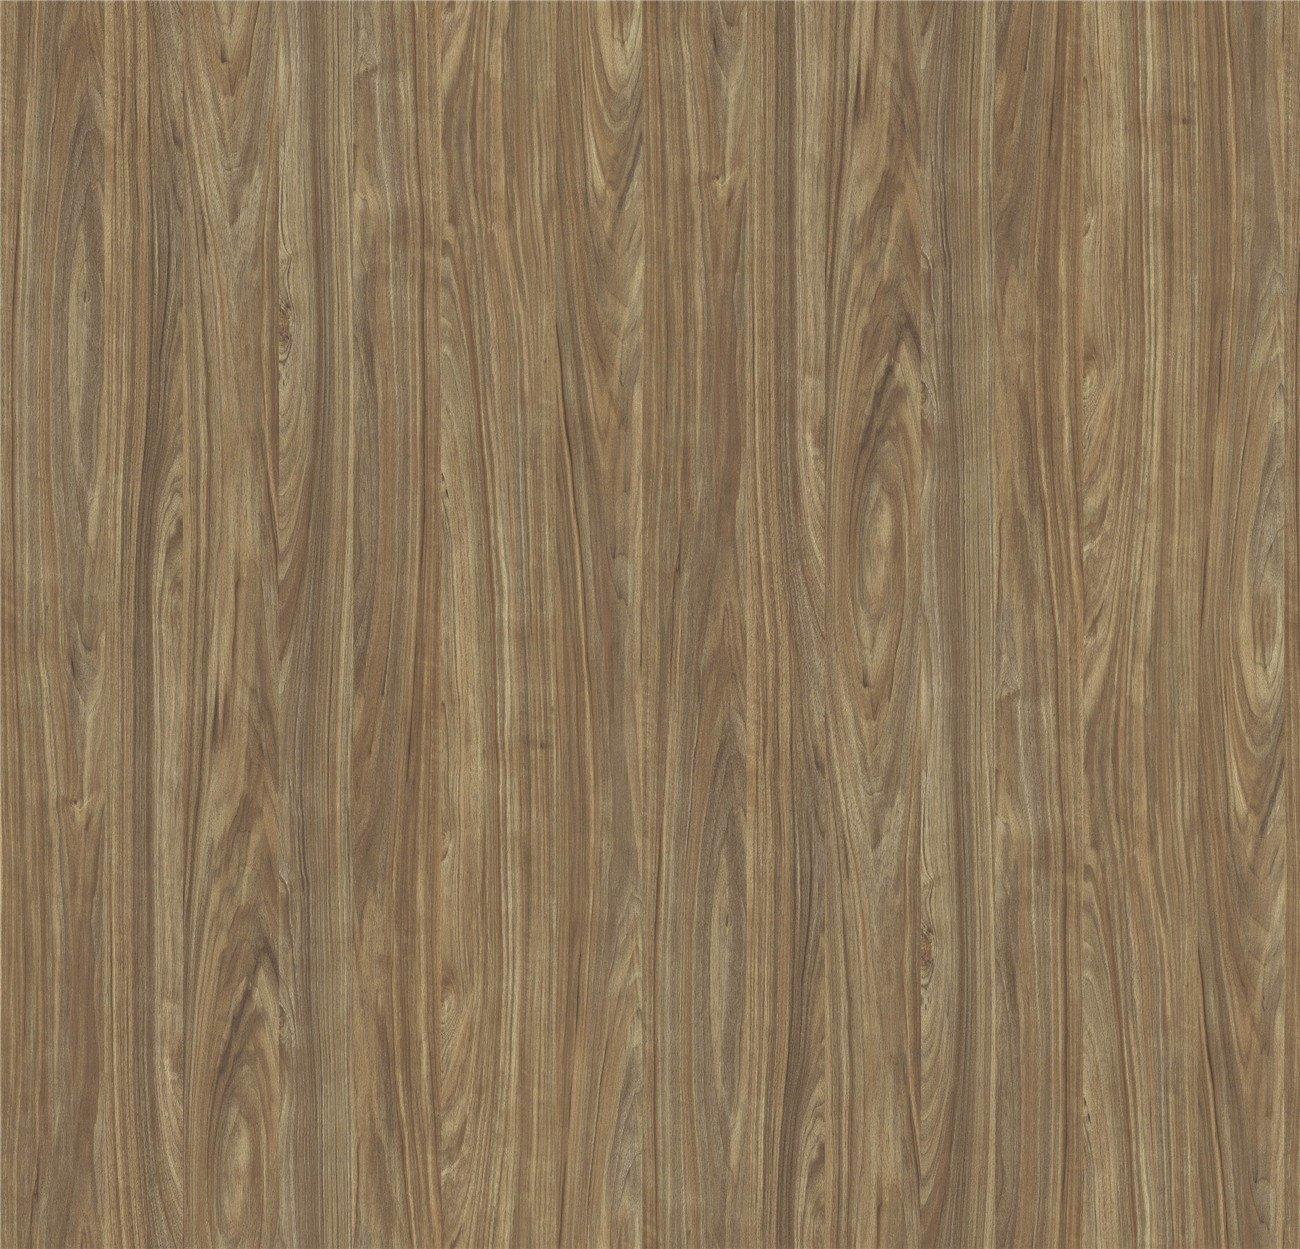 grain decorative paper laminate series for drawing room I.DECOR-1